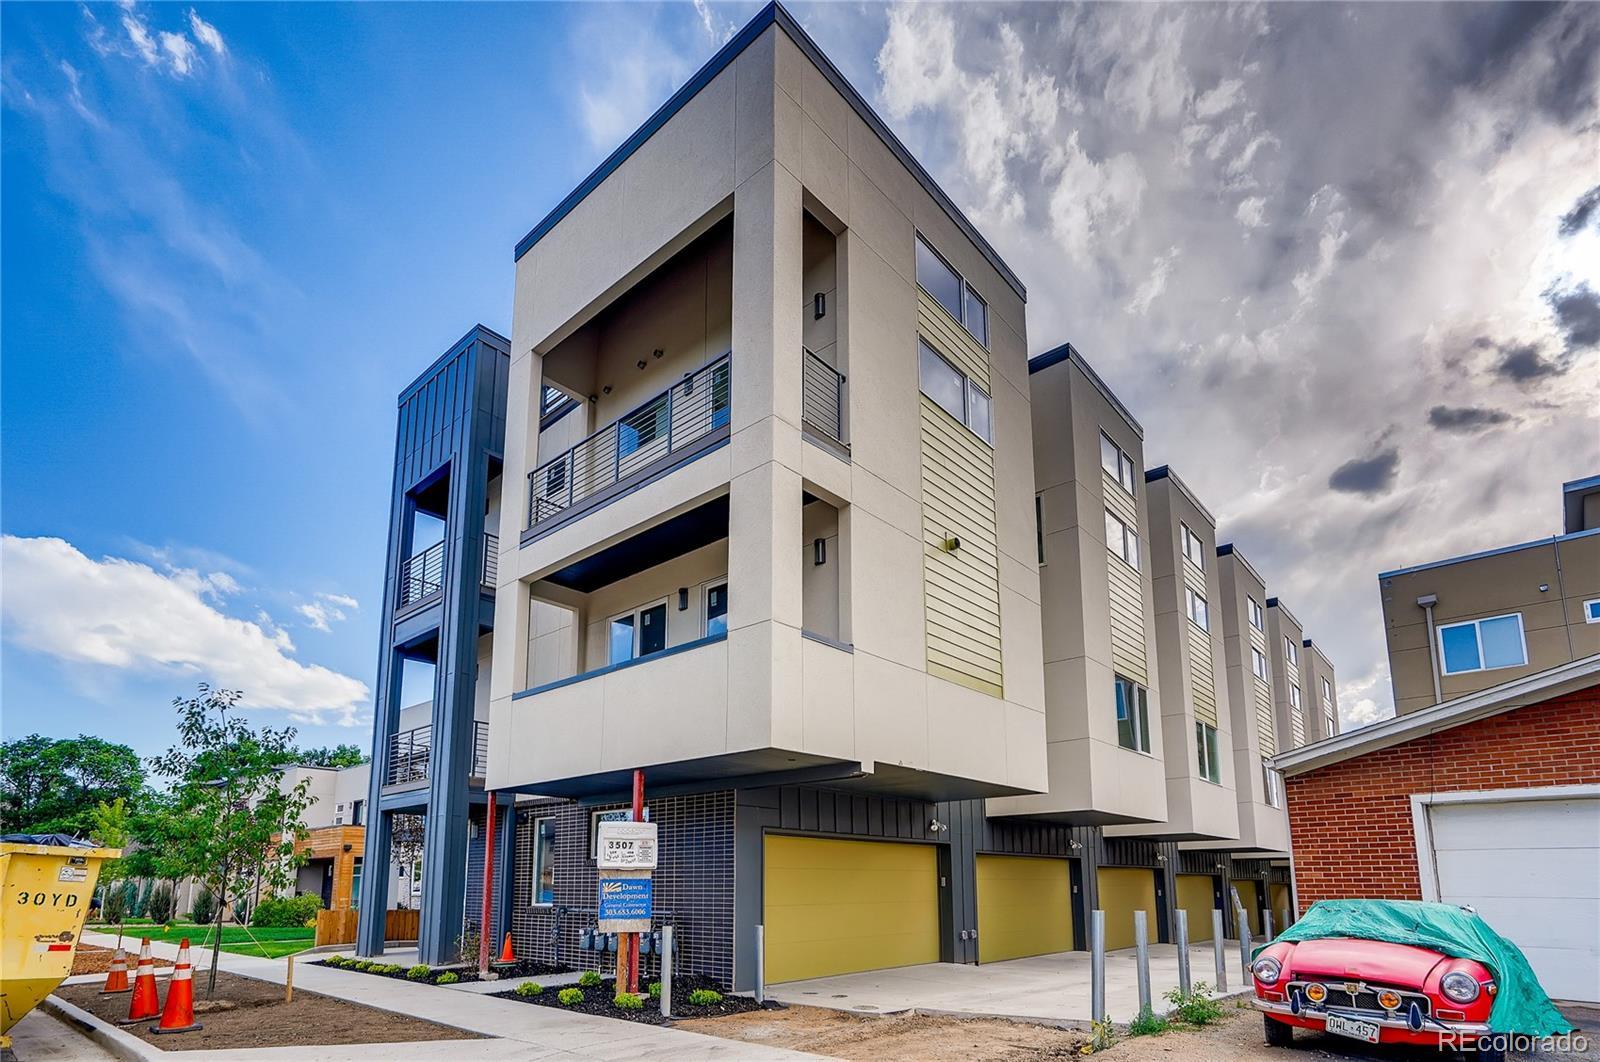 3507 S Ogden Street #B Property Photo - Englewood, CO real estate listing